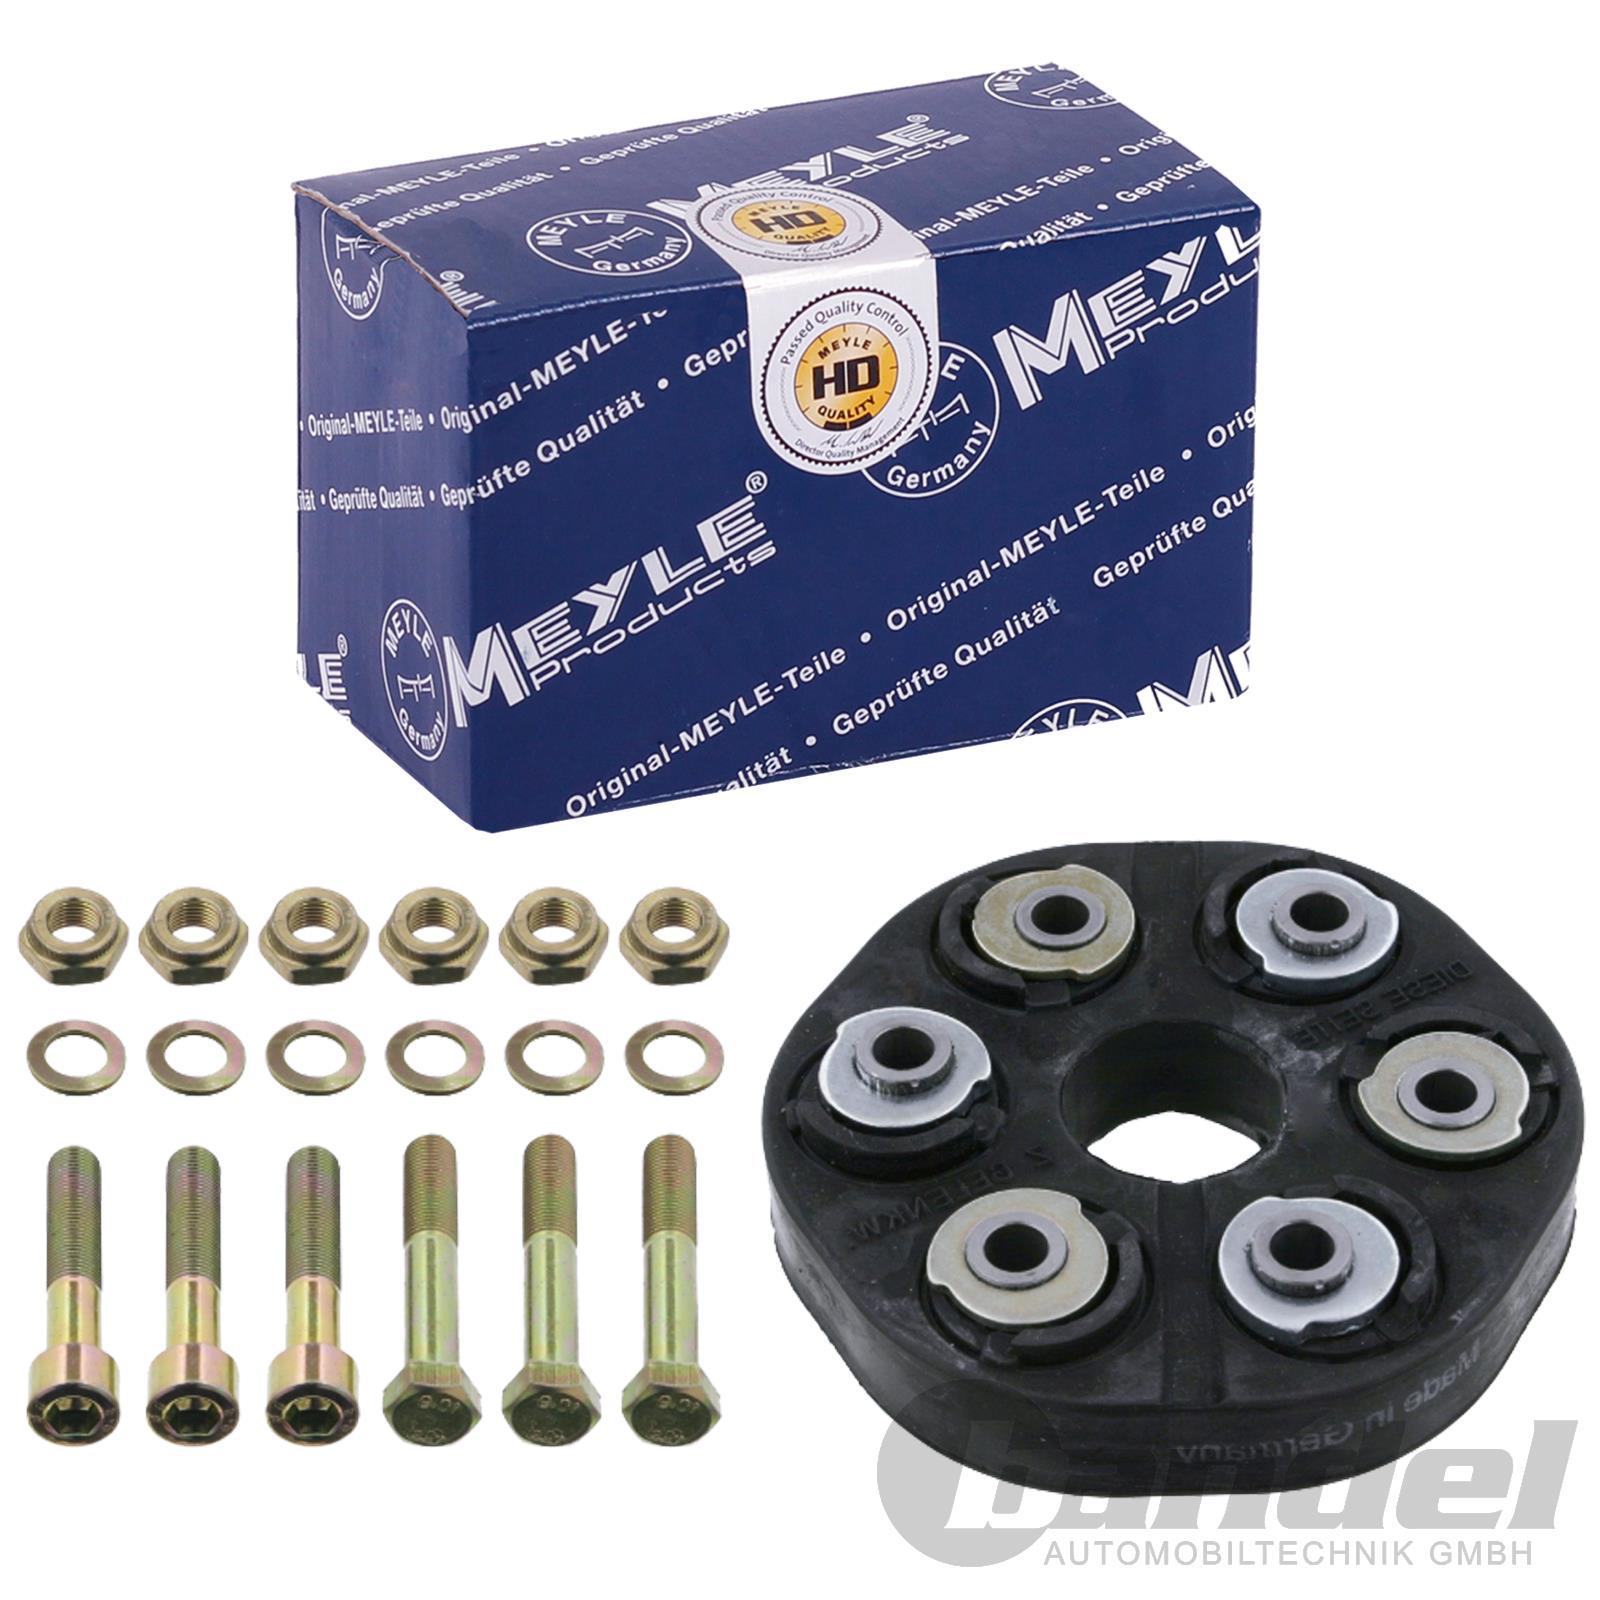 1x MEYLE HD GELENK//HARDYSCHEIBE MERCEDES-BENZ 190 W201 C124 E-KLASSE W124 A124